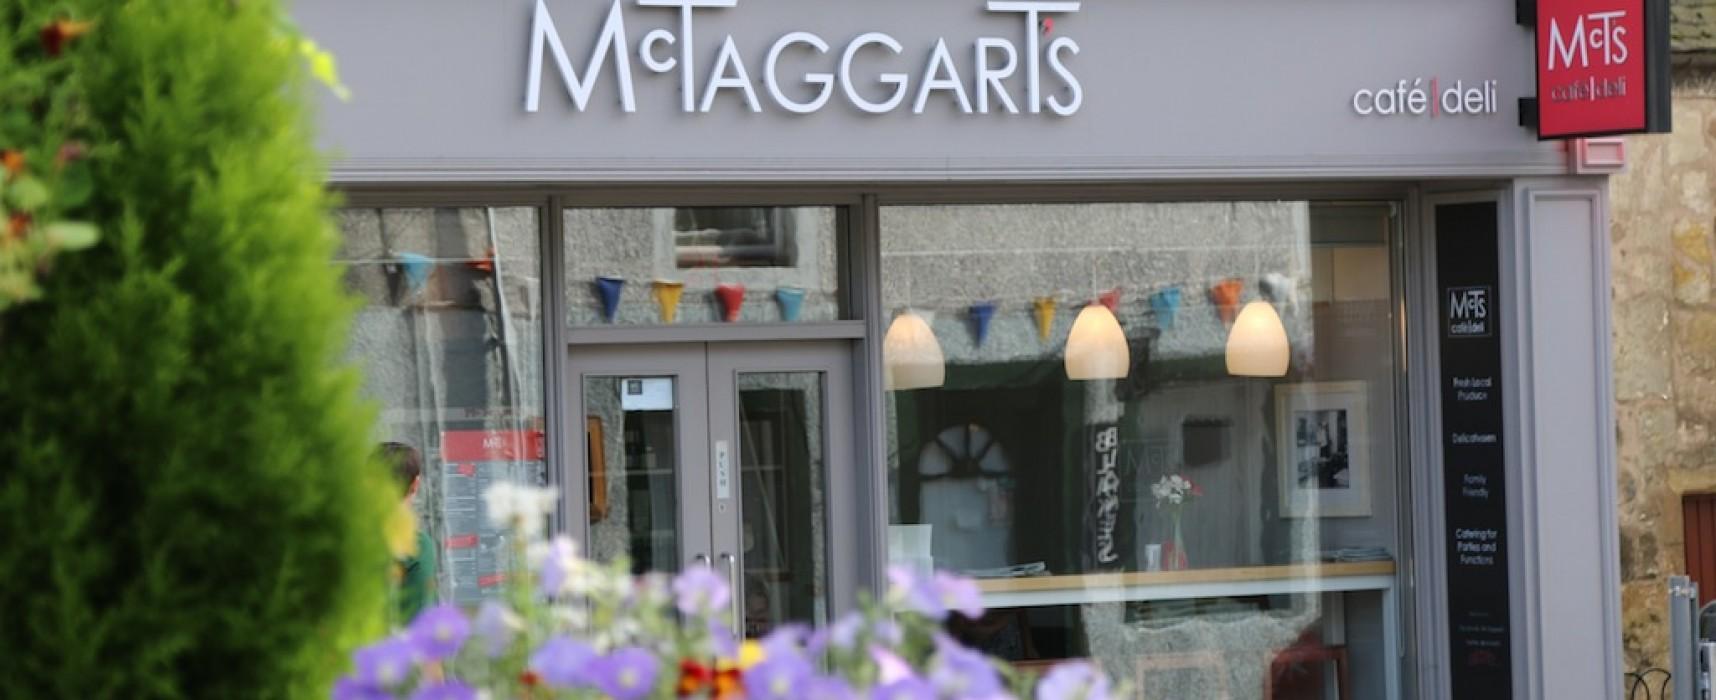 McTaggart's Cafe, Fife Coastal Path, Aberdour